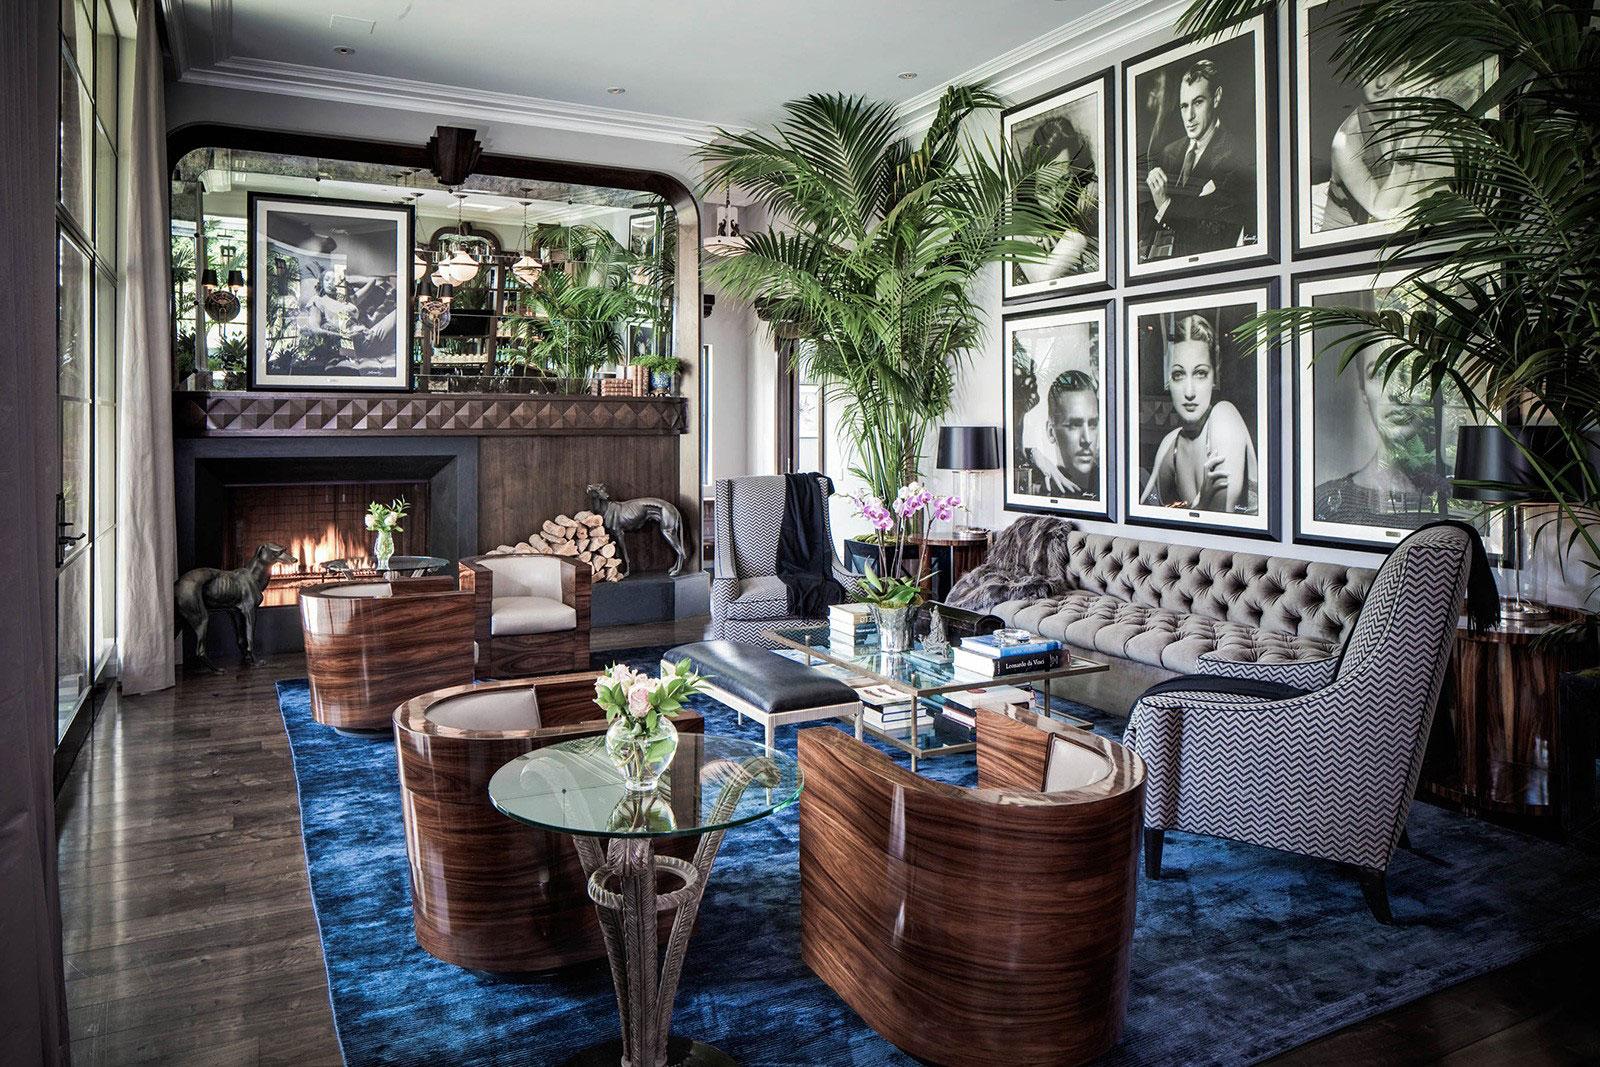 Art Nouveau-interior-design-with-its-style-decor-and-colors-8 Art Nouveau-interior design with its style, decor and colors